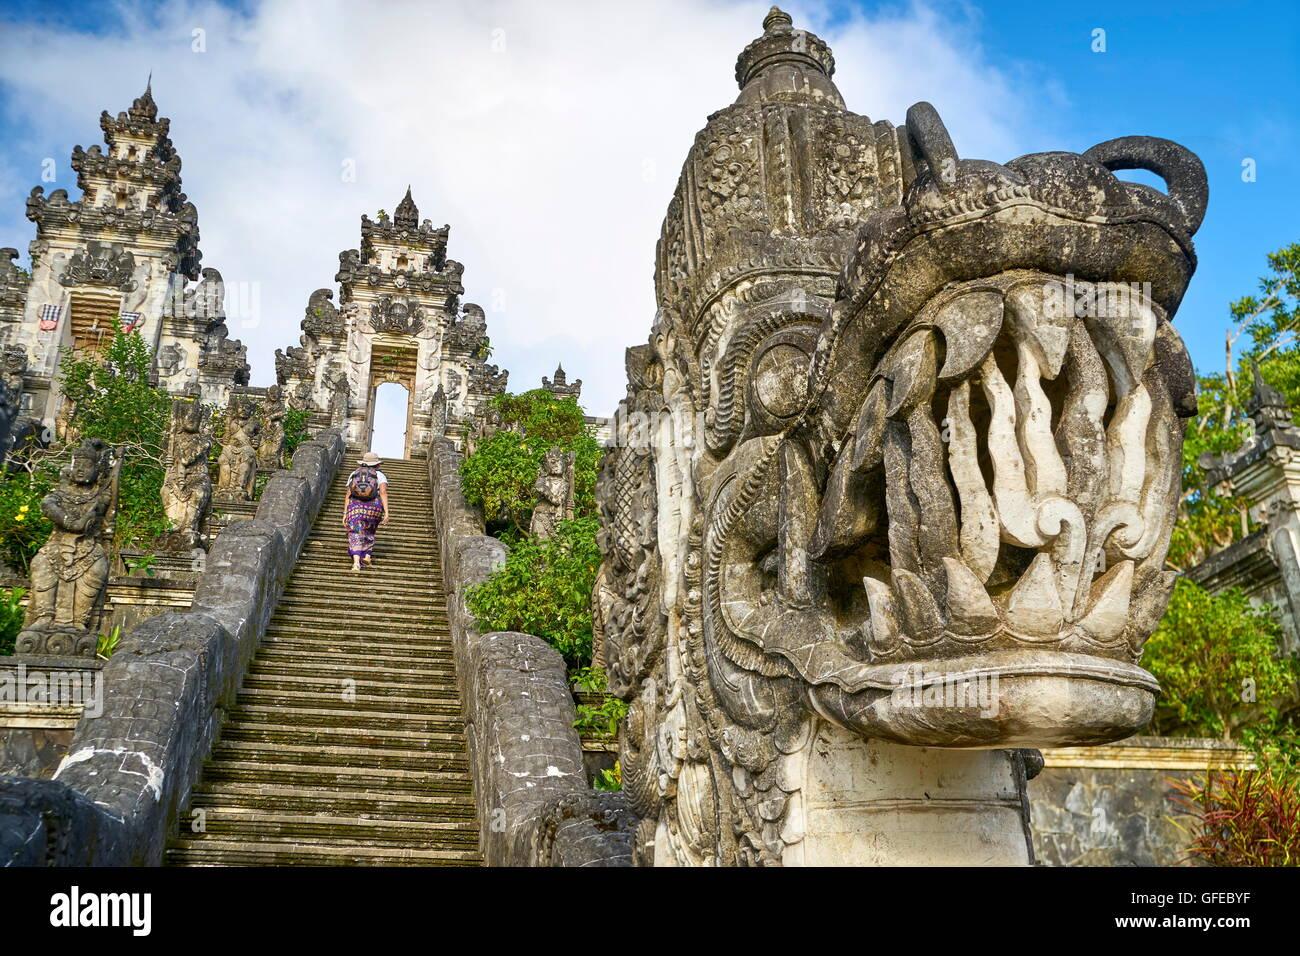 Visage de dragon, Pura Penataran Temple de Lempuyang, Bali, Indonésie Photo Stock